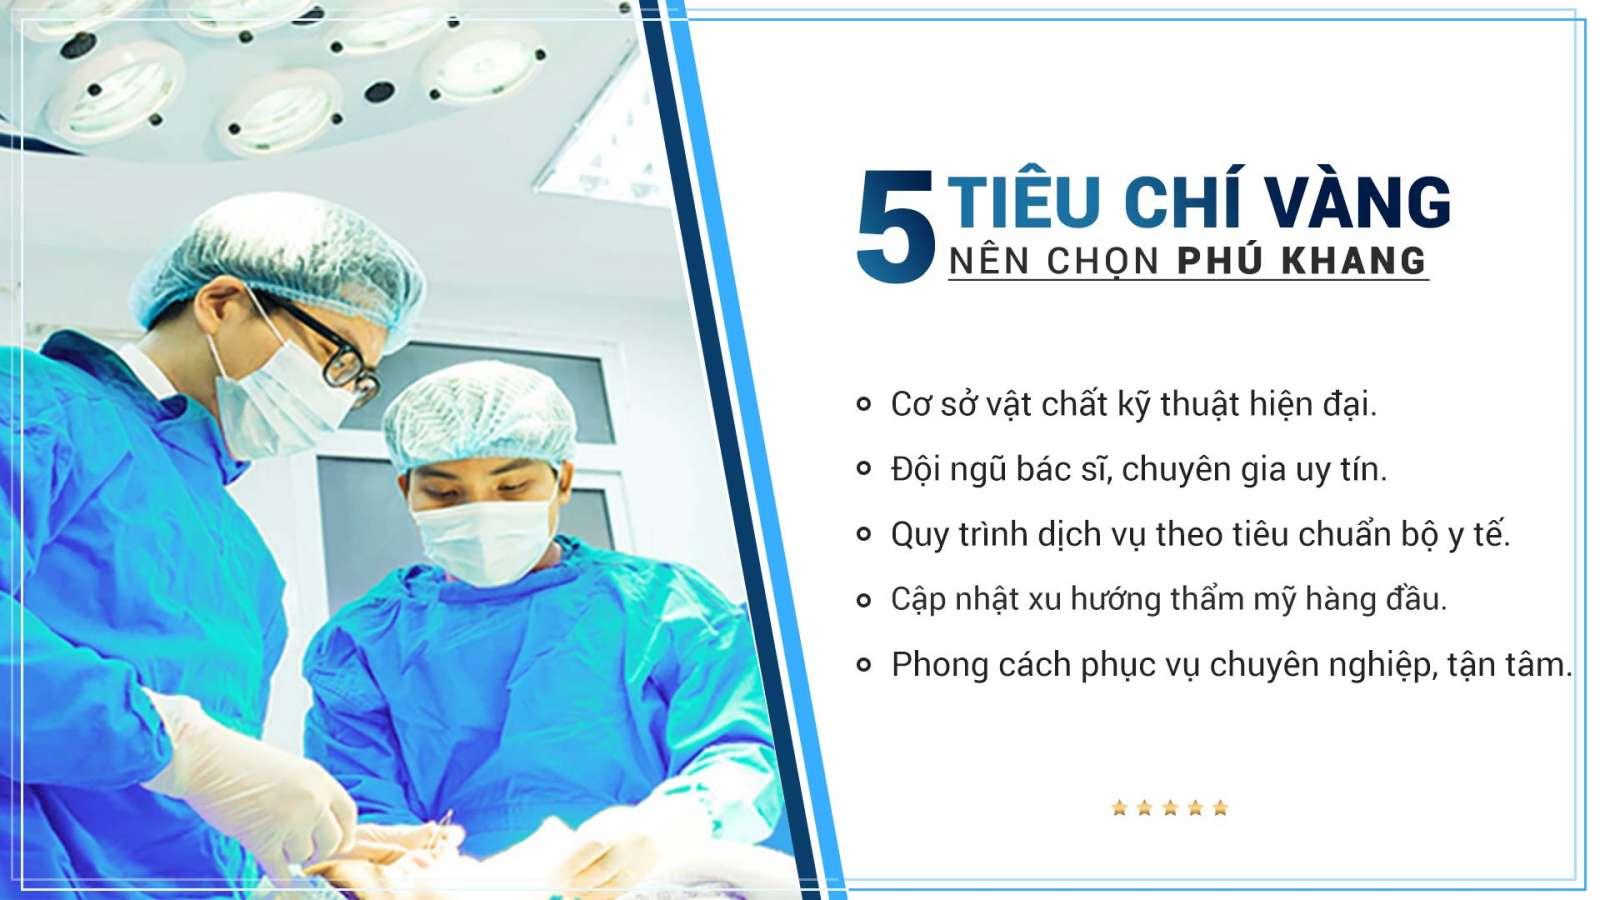 5-tieu-chi-vang-cua-phu-khang